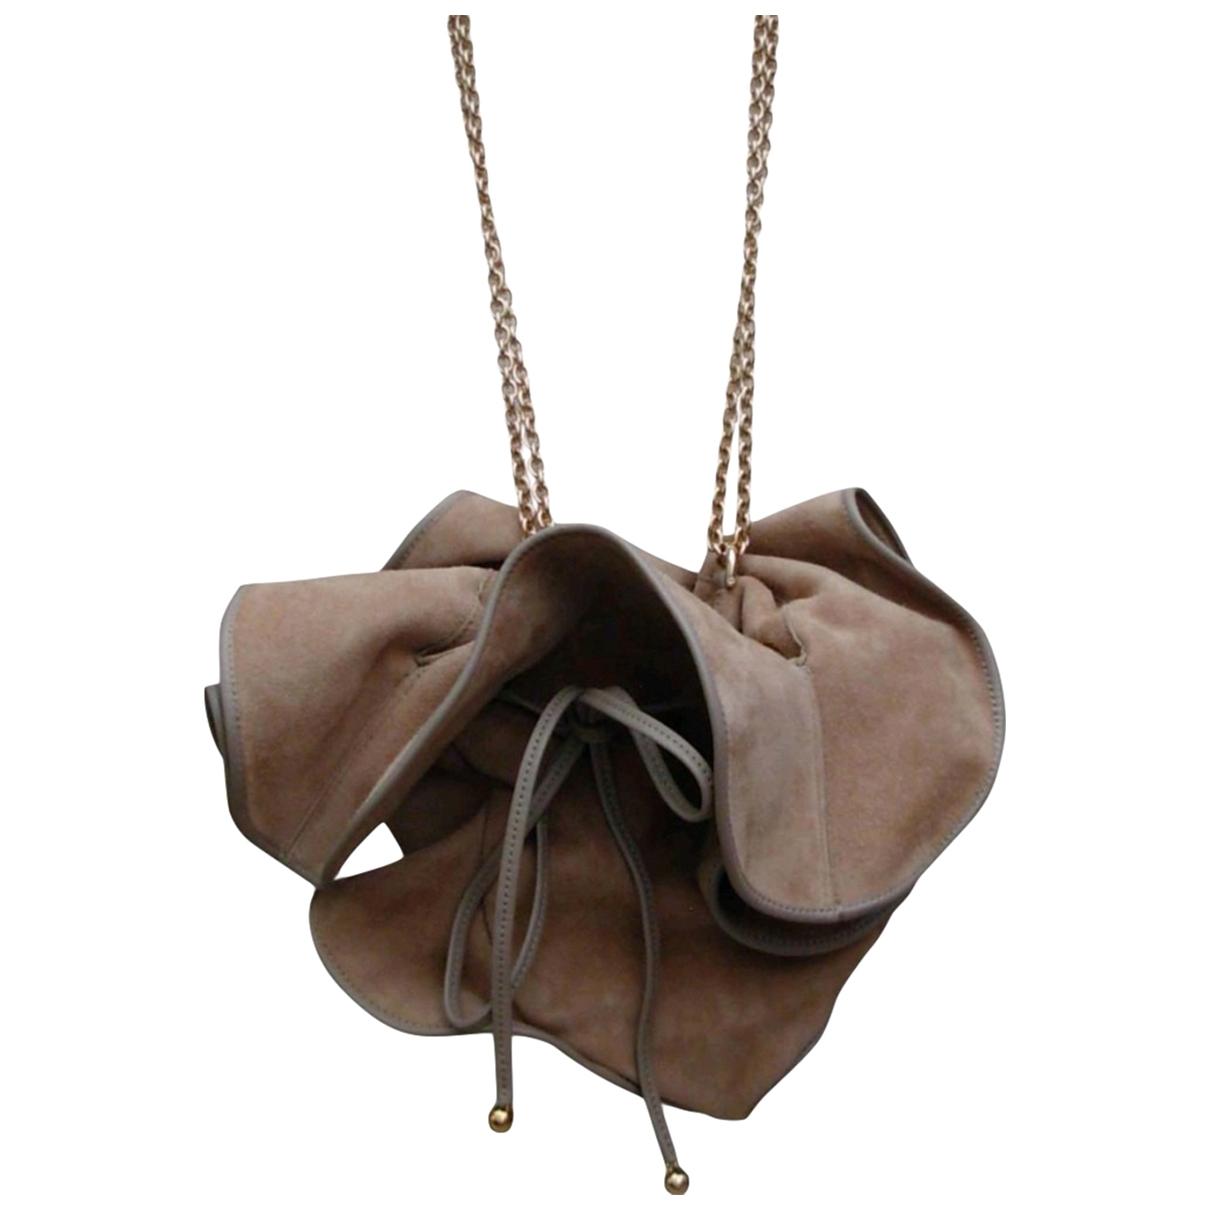 Nina Ricci \N Beige Suede handbag for Women \N